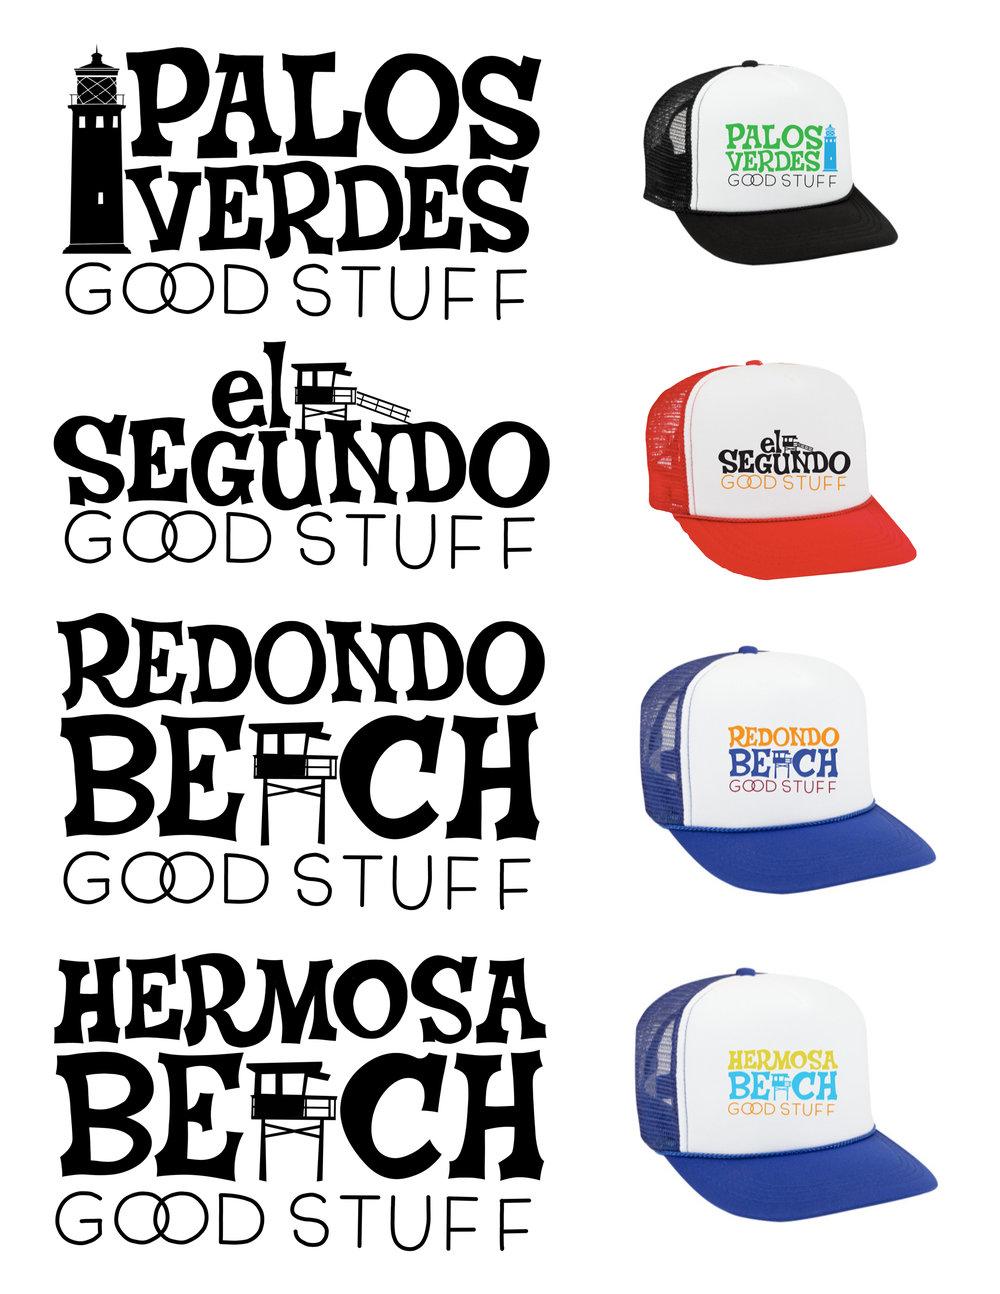 goodstuff-hats.jpg